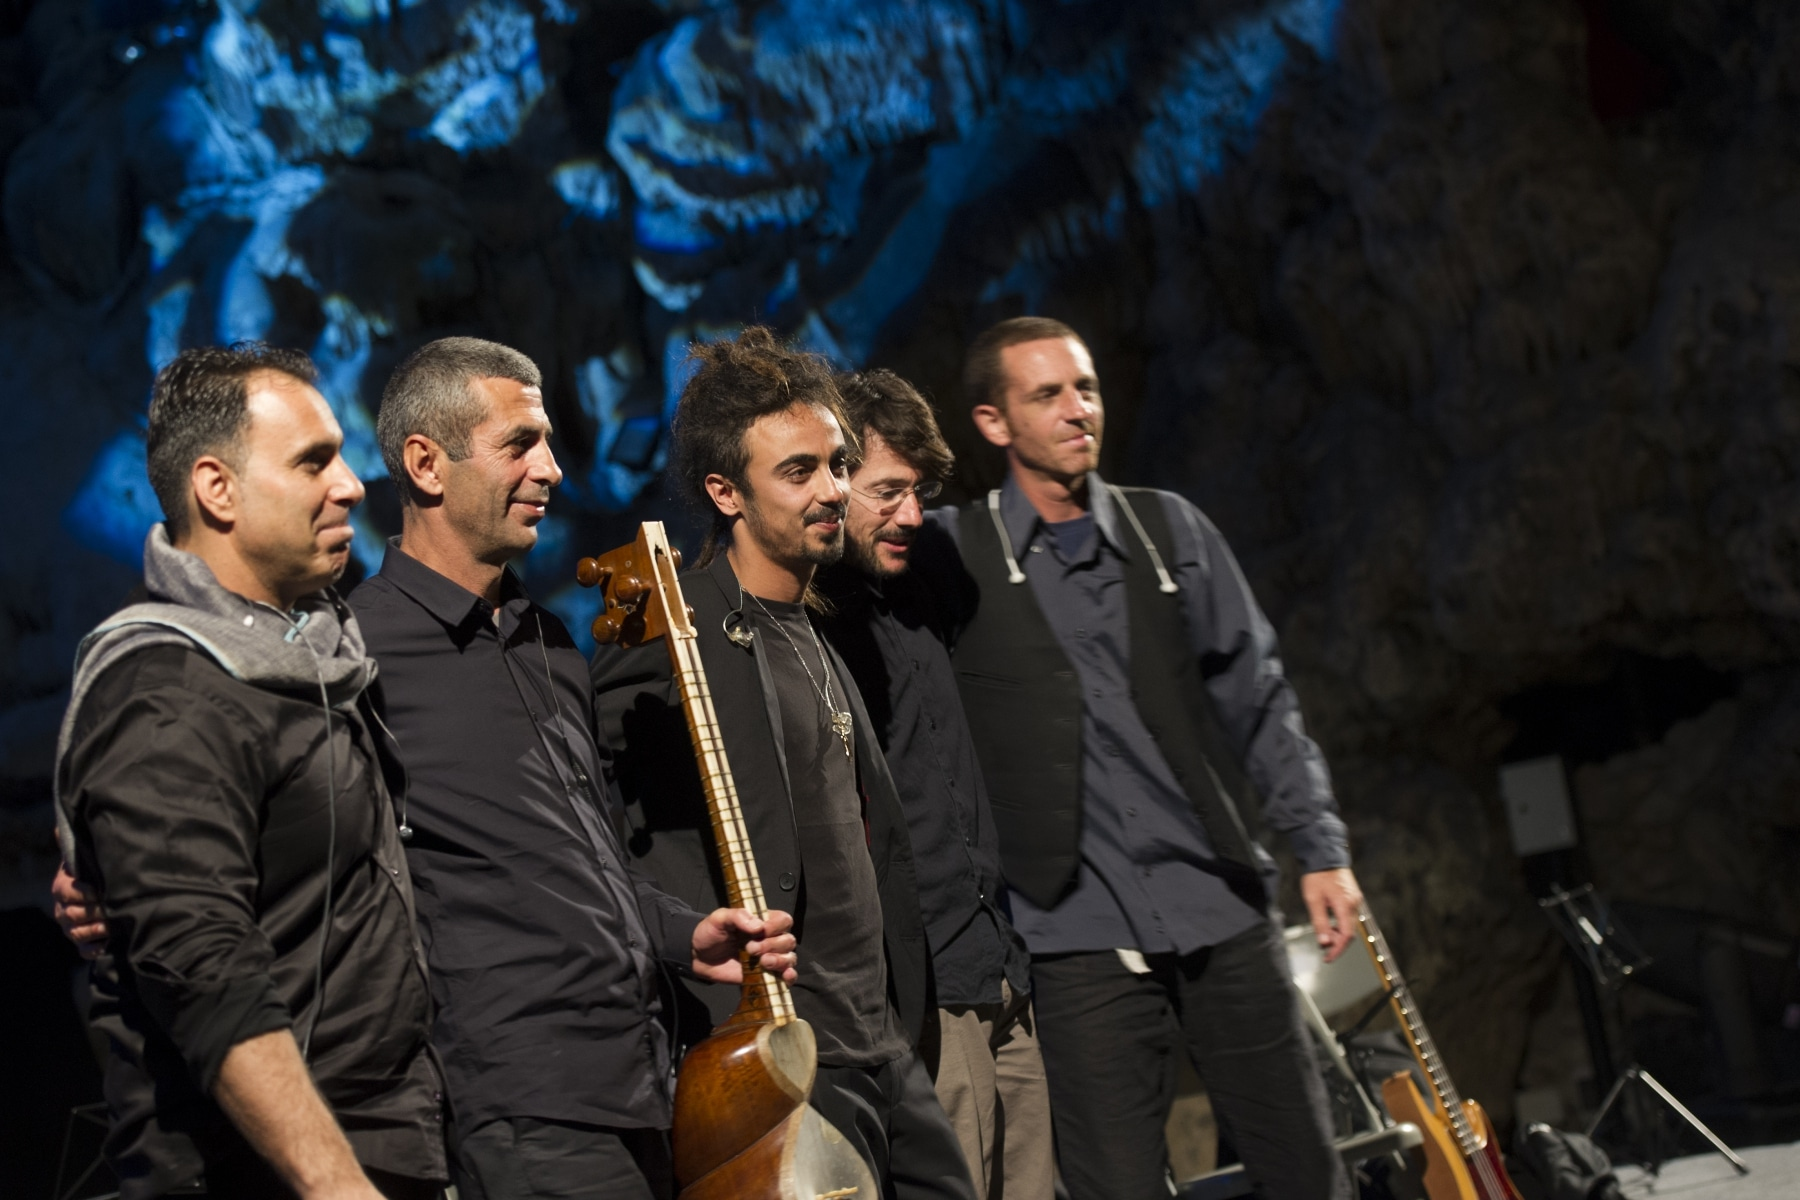 gibraltar-world-music-festival-dia-2-mark-eliyahu-ensemble-12_9222710581_o